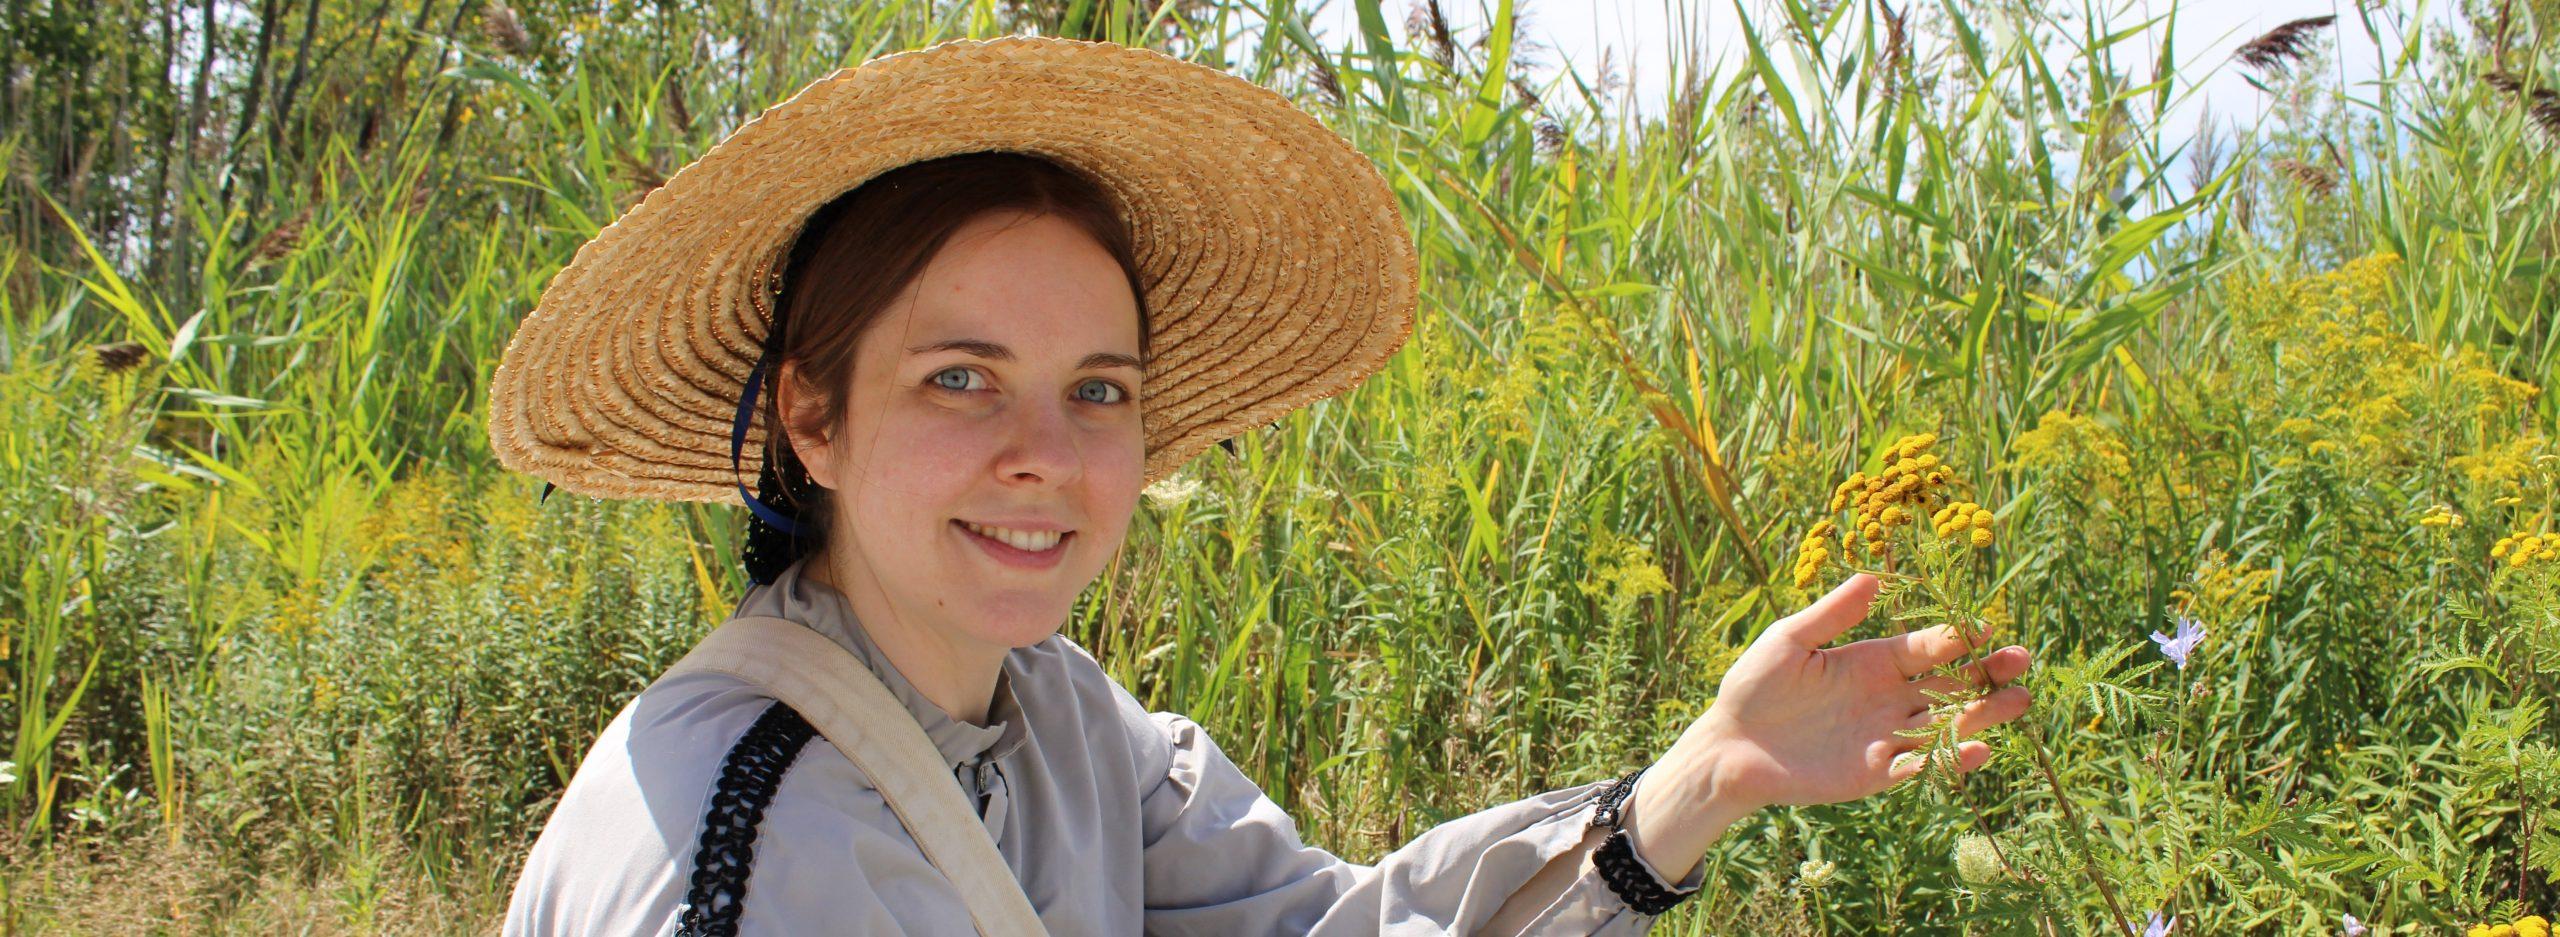 Black Creek Pioneer Village history actor in costume examines Common Tansy plant